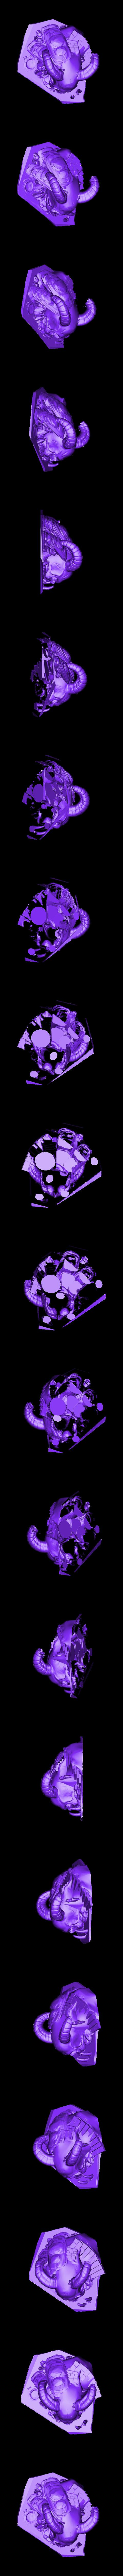 escenografia temple skull.stl Download STL file Temple skull • 3D printing model, cesarast